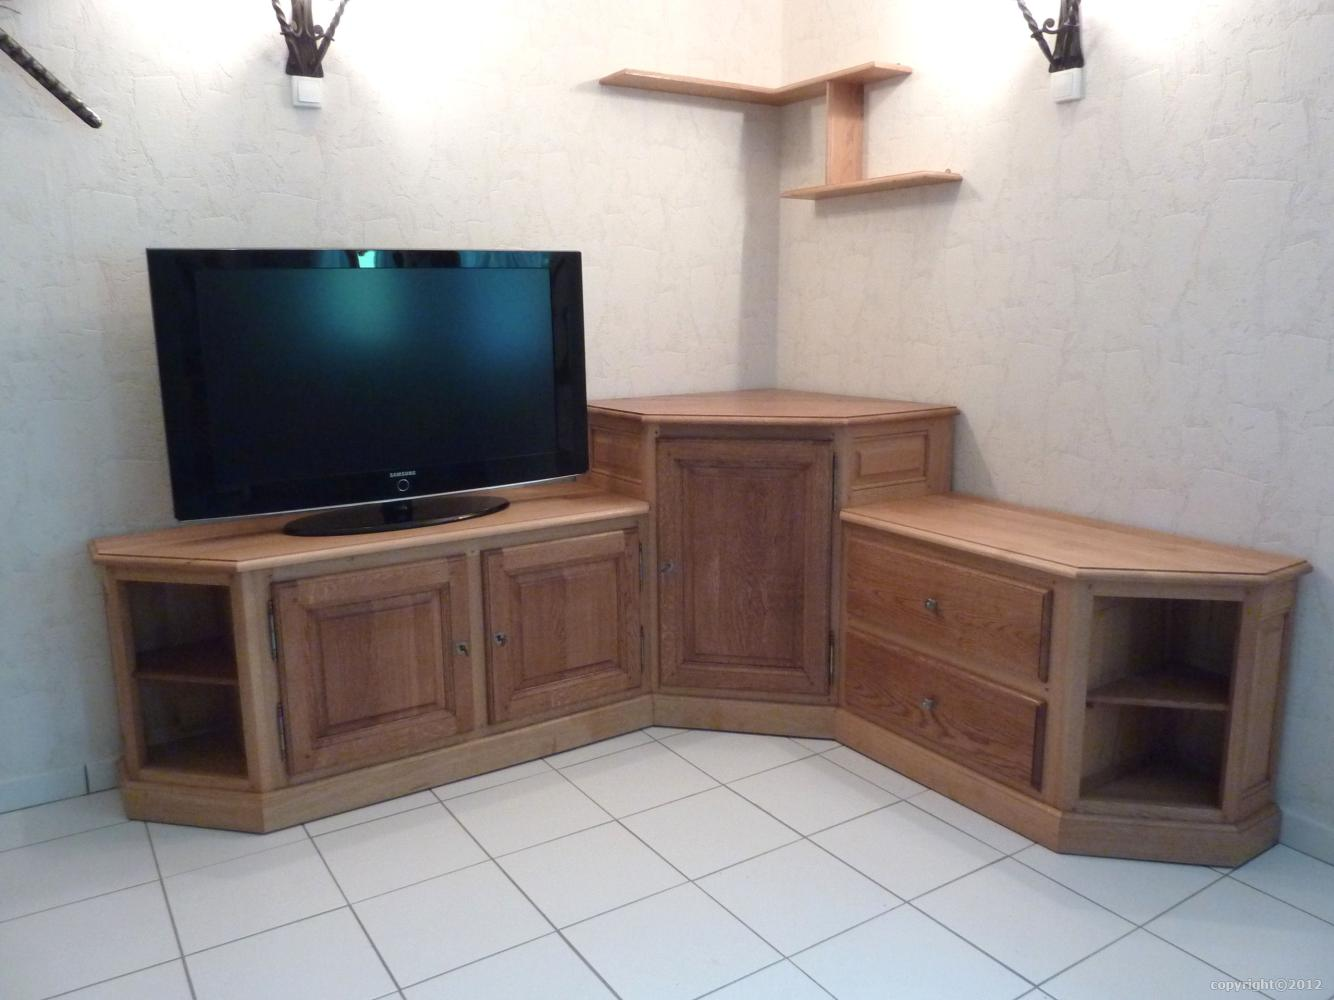 meuble tv hifi sur mesure en massif style contemporain. Black Bedroom Furniture Sets. Home Design Ideas